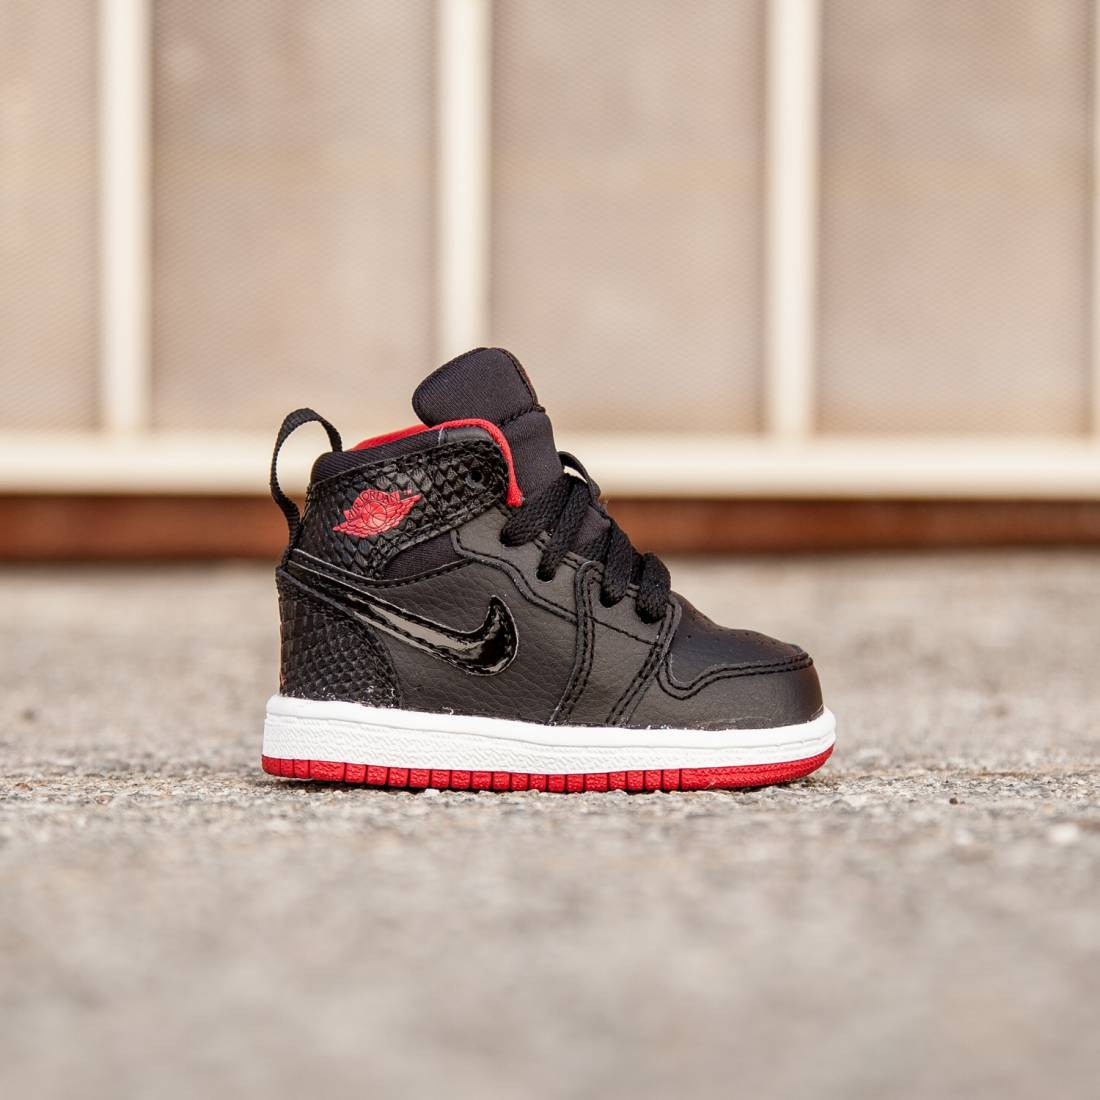 Air Jordan 1 Retro High Toddlers (black / white / gym red)